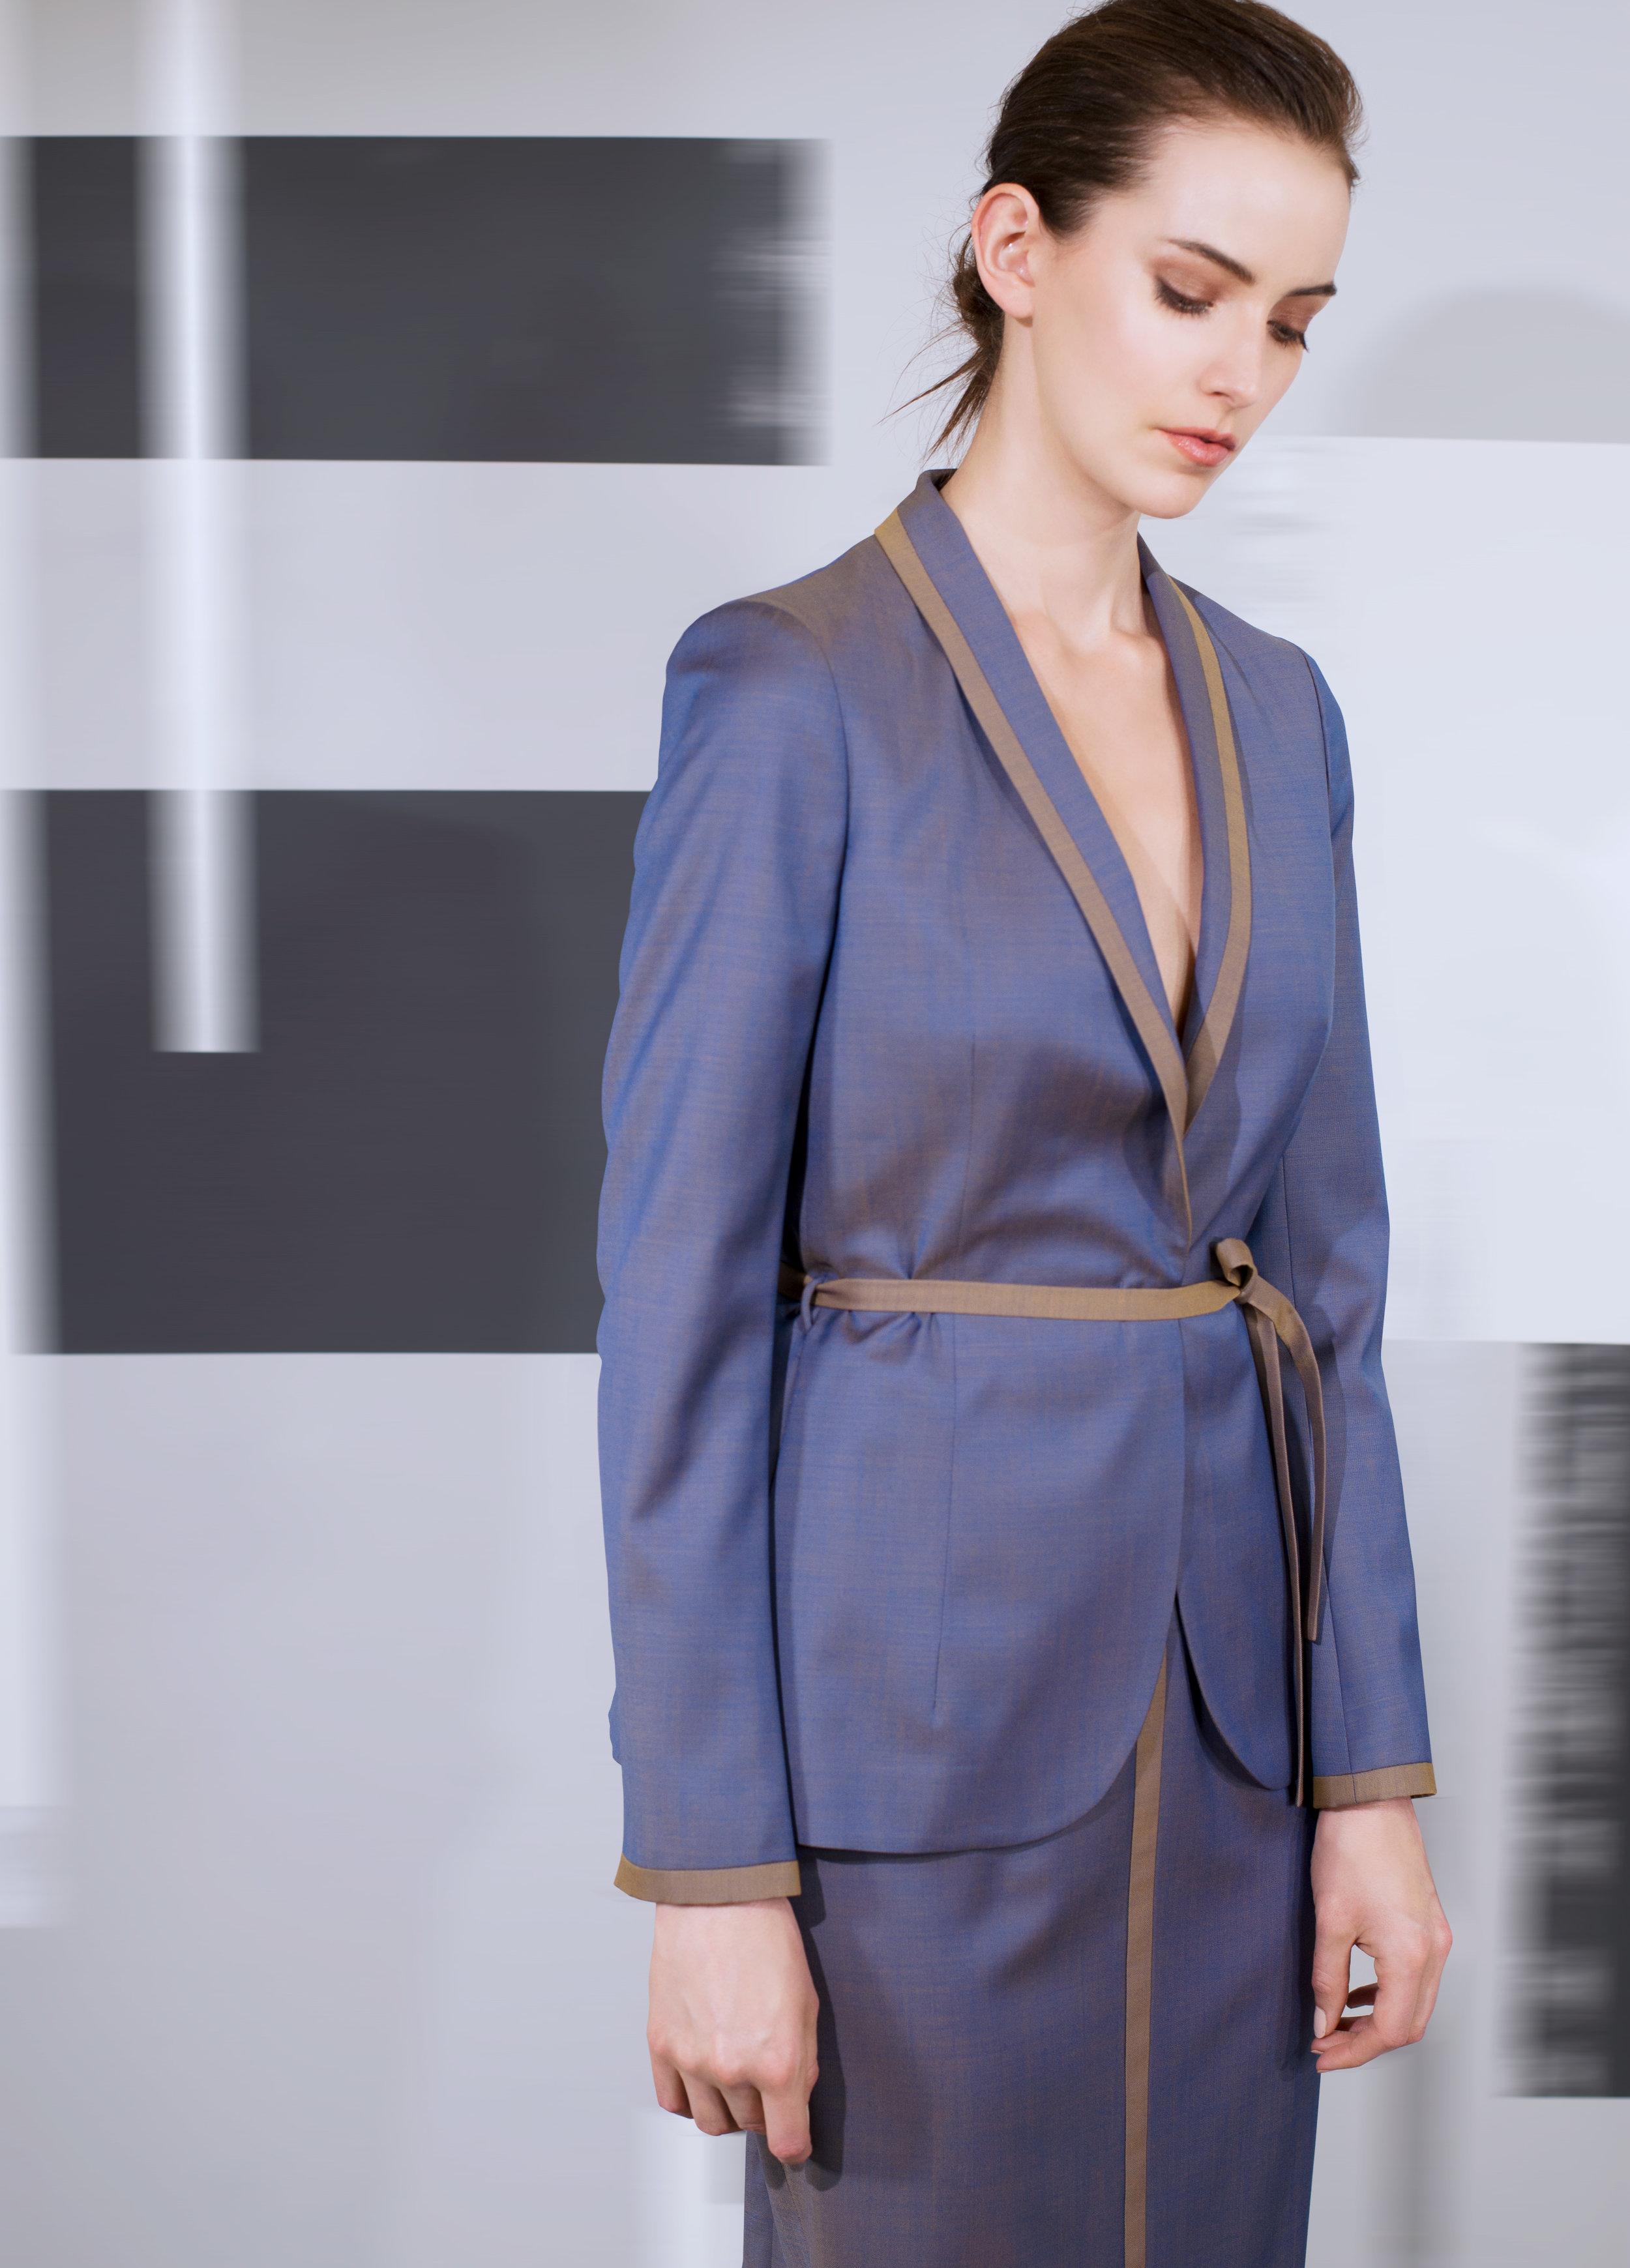 Soft comfort wool pleated back and banding trim jacket and skirt  black pearl enameled teal blue amber mercury blue   Crocodile calf-skin single handle bag